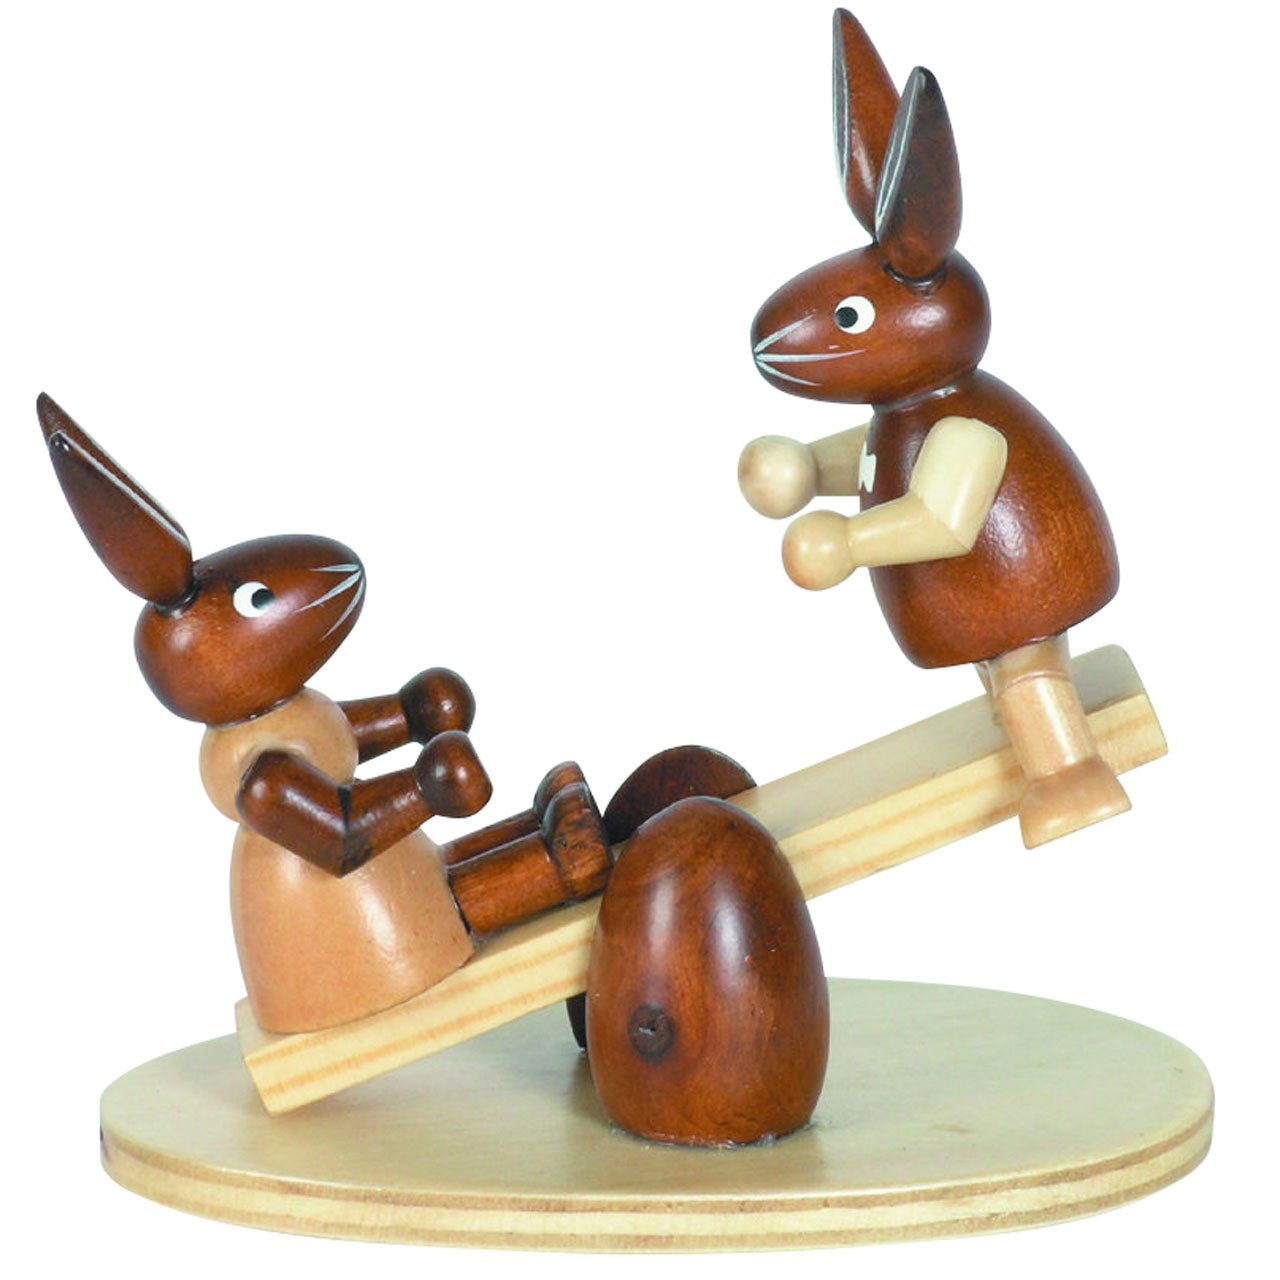 Großes Osterhasenpaar 42cm Erzgebirge Handarbeit Hasen-Paar Osterhasen Osterhase